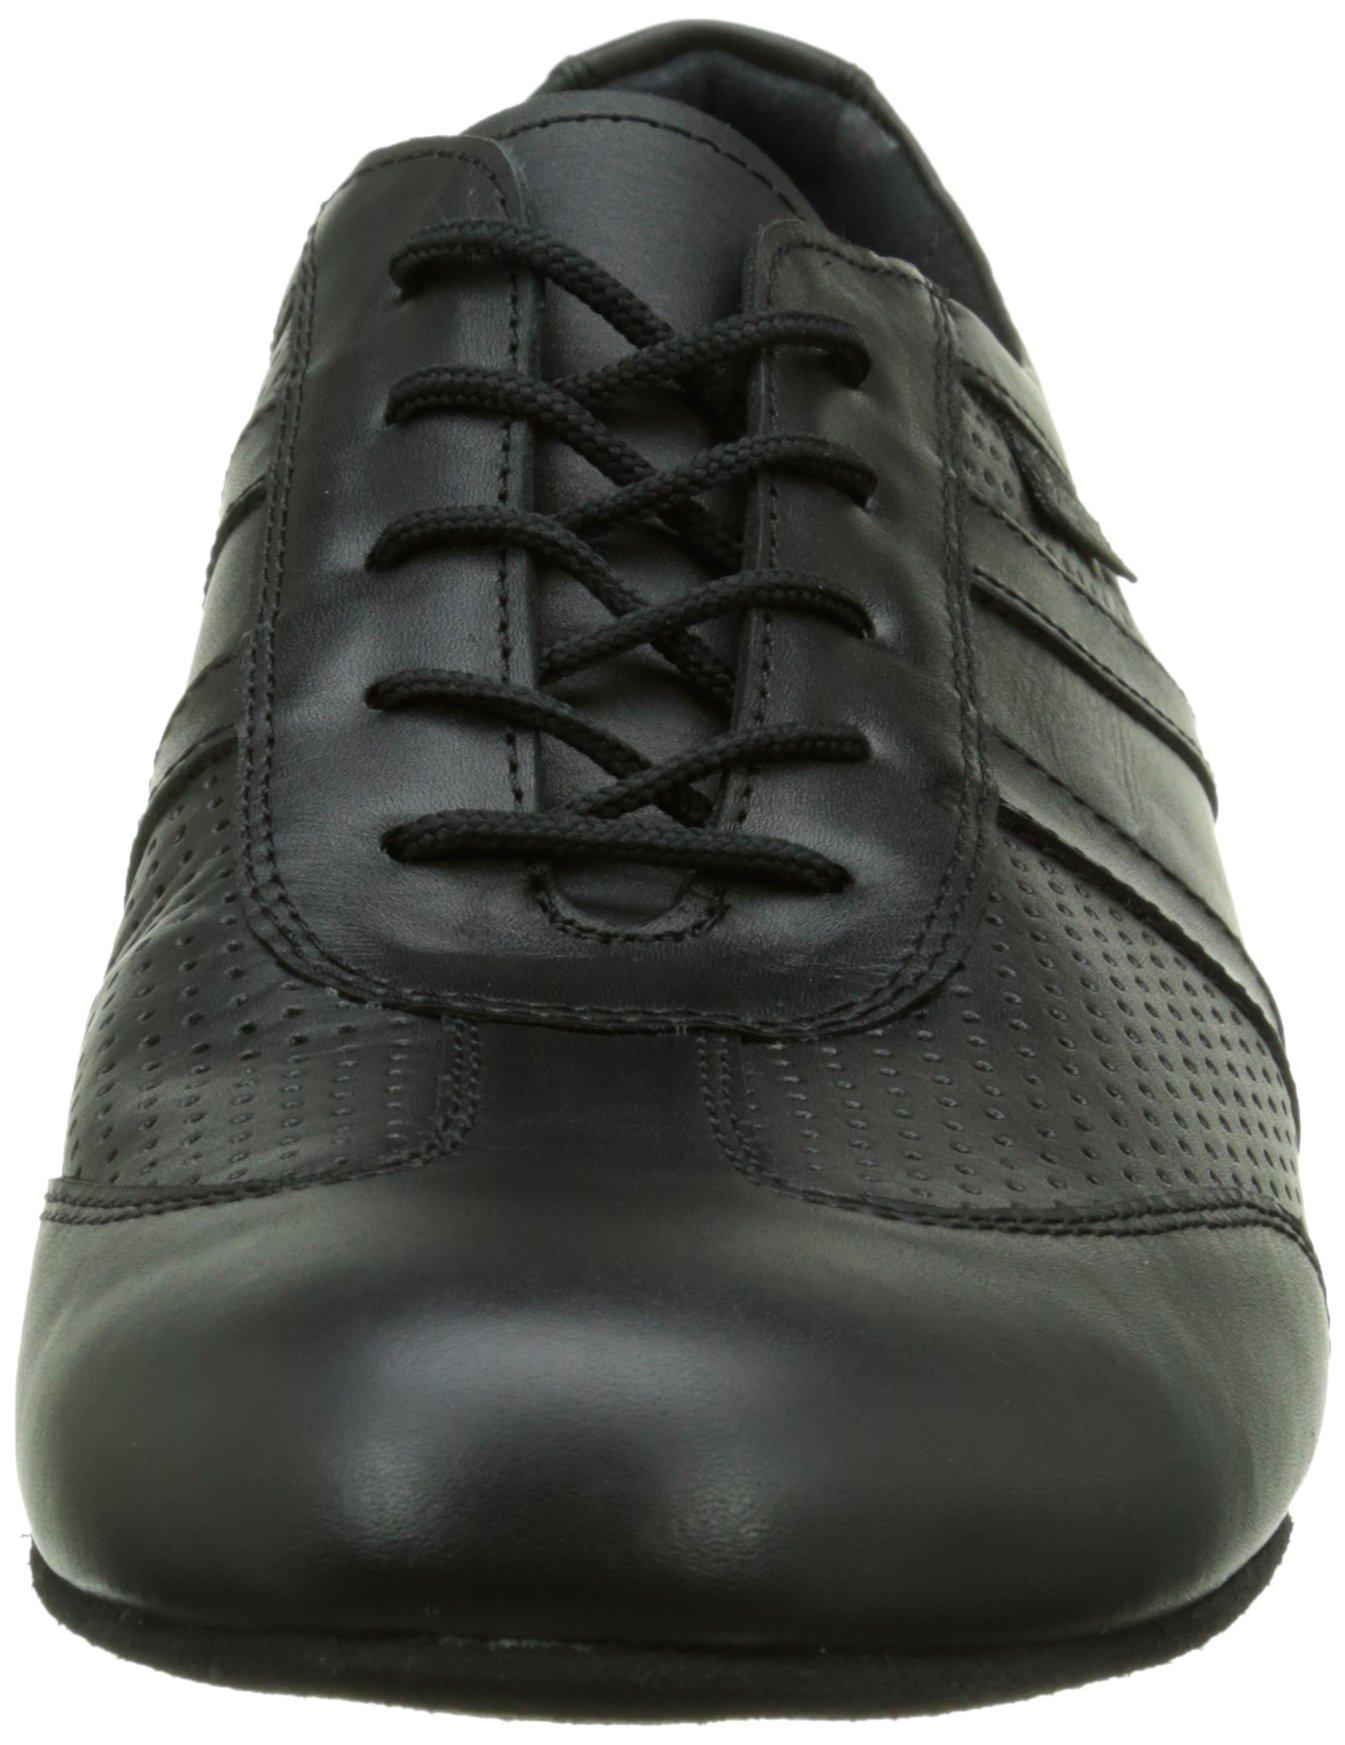 Diamant Men's Model 13 Dance Sneaker- 1'' (2.5 cm) Wedge Heel (Wide - H Width), 13.5 W US (13 UK) by Diamant (Image #4)